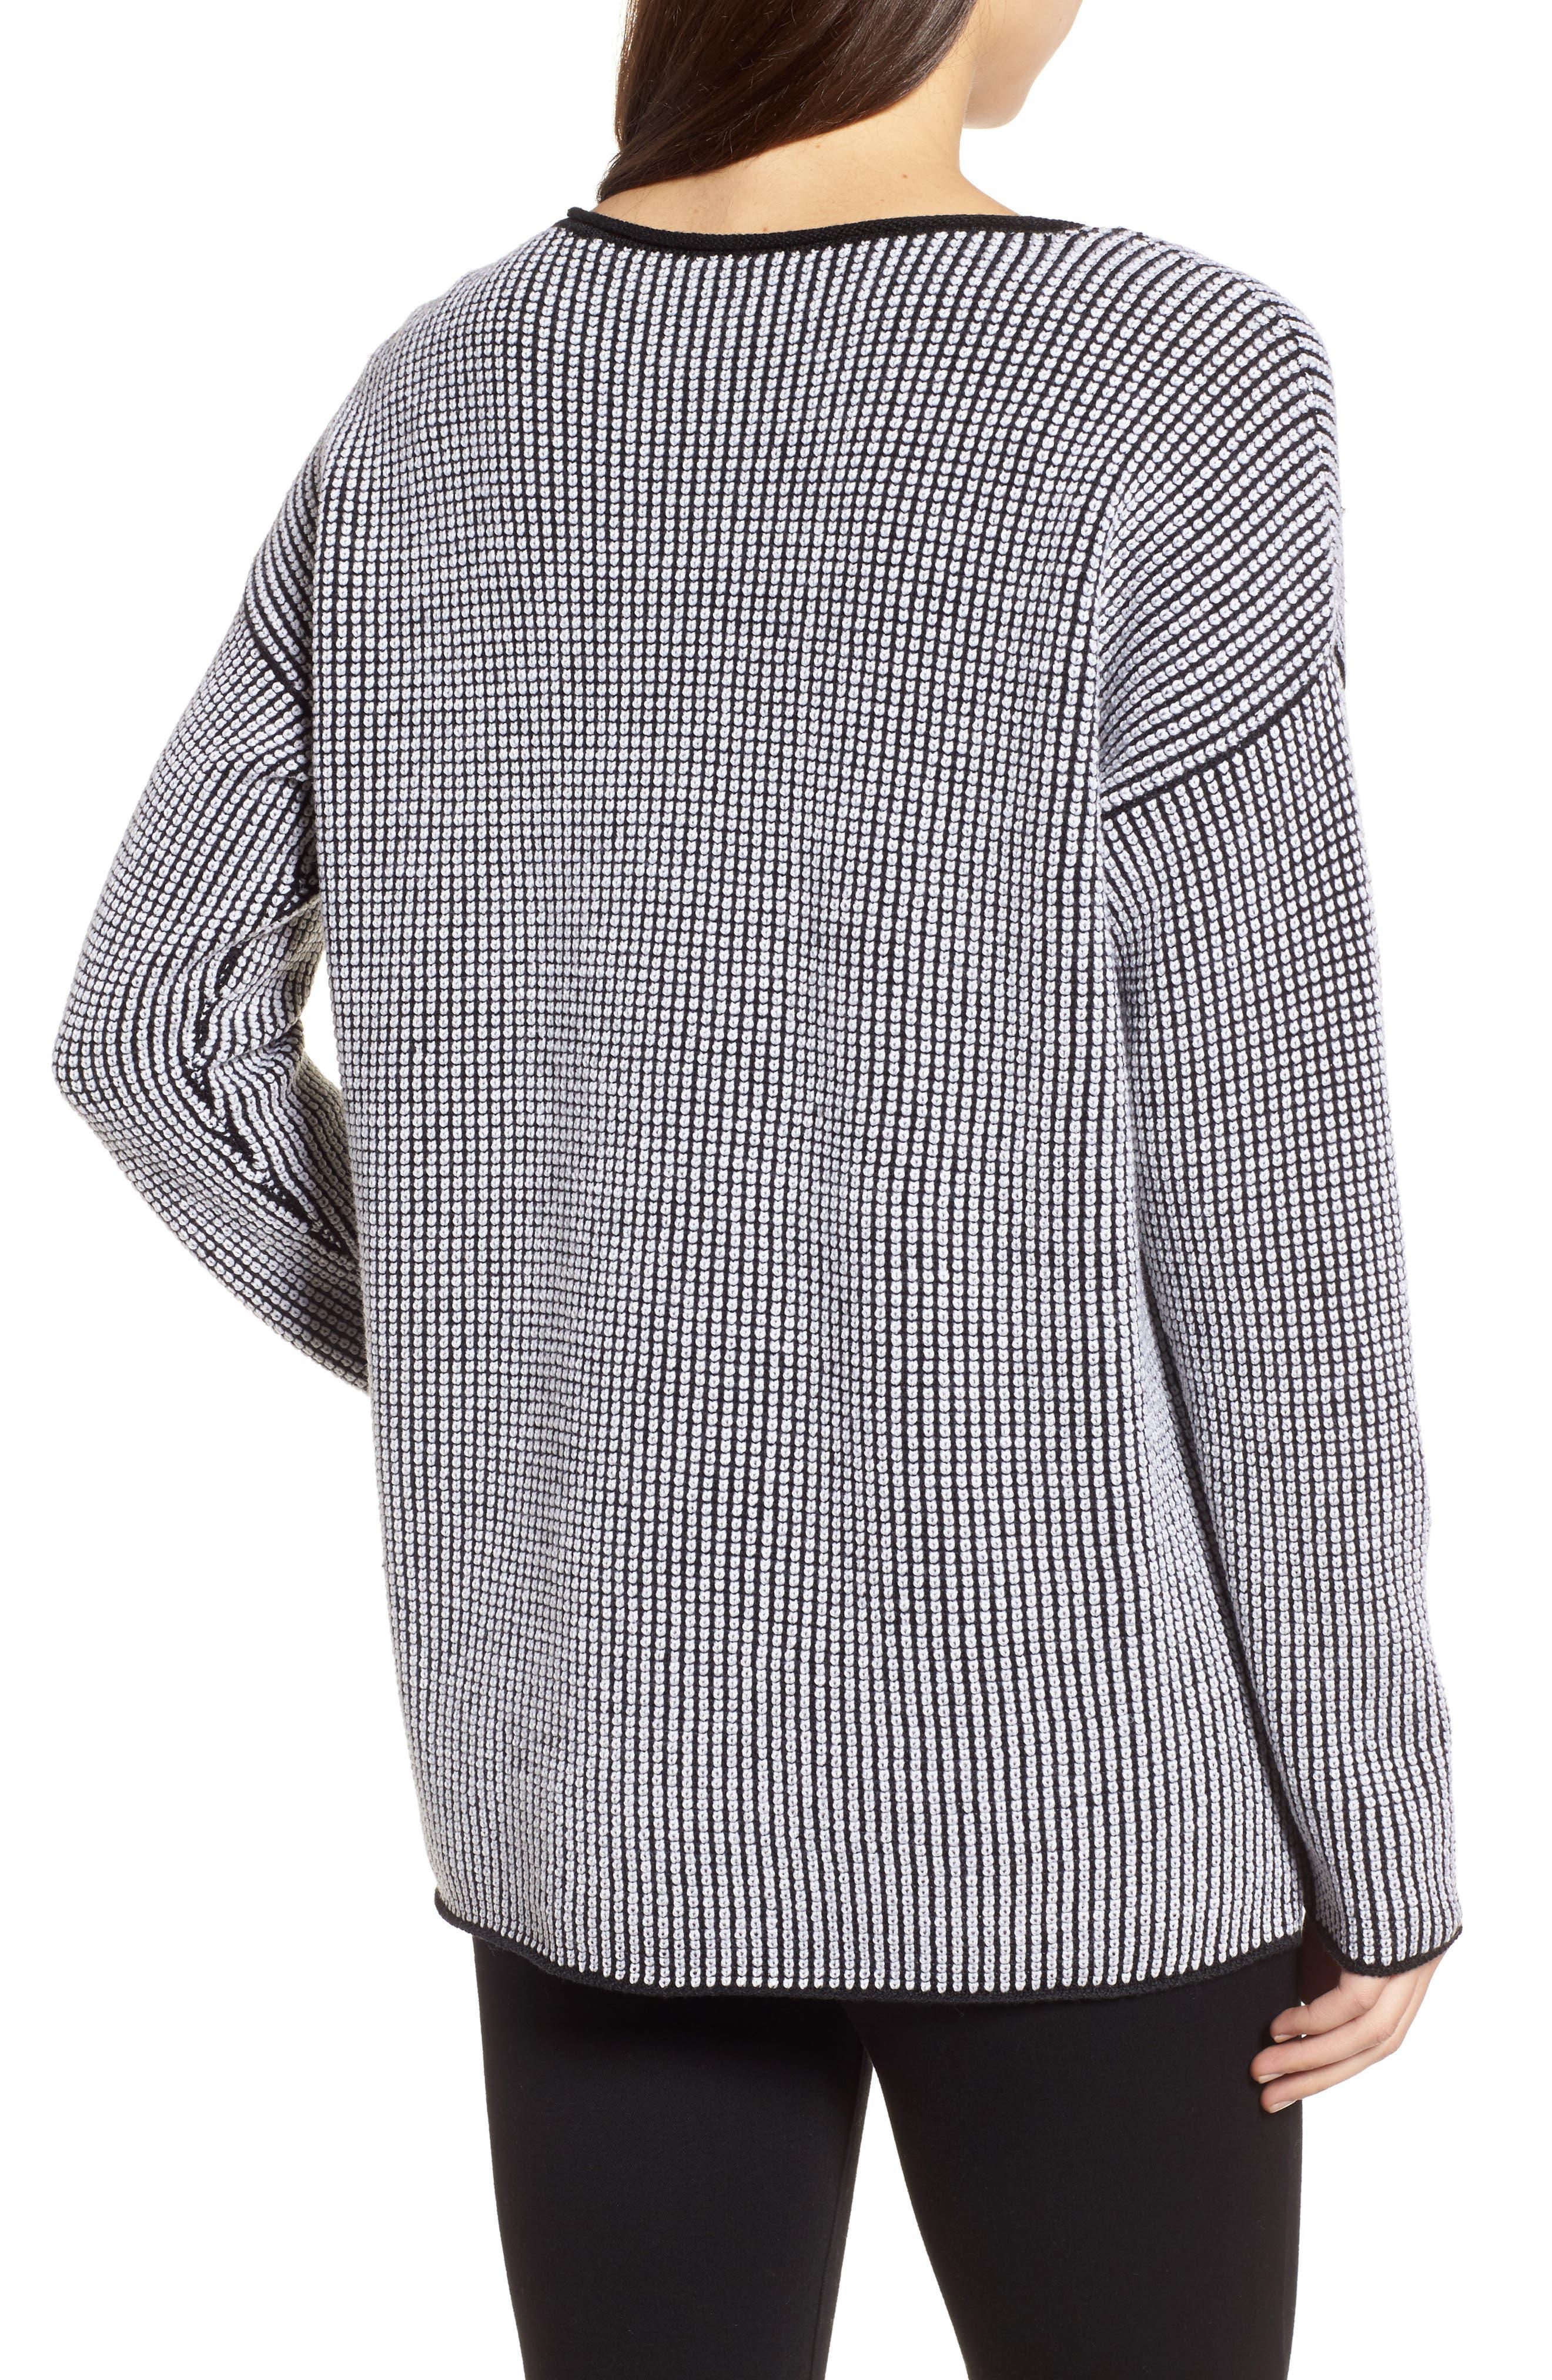 Textured Merino Wool Sweater,                             Alternate thumbnail 3, color,                             Black/ Soft White